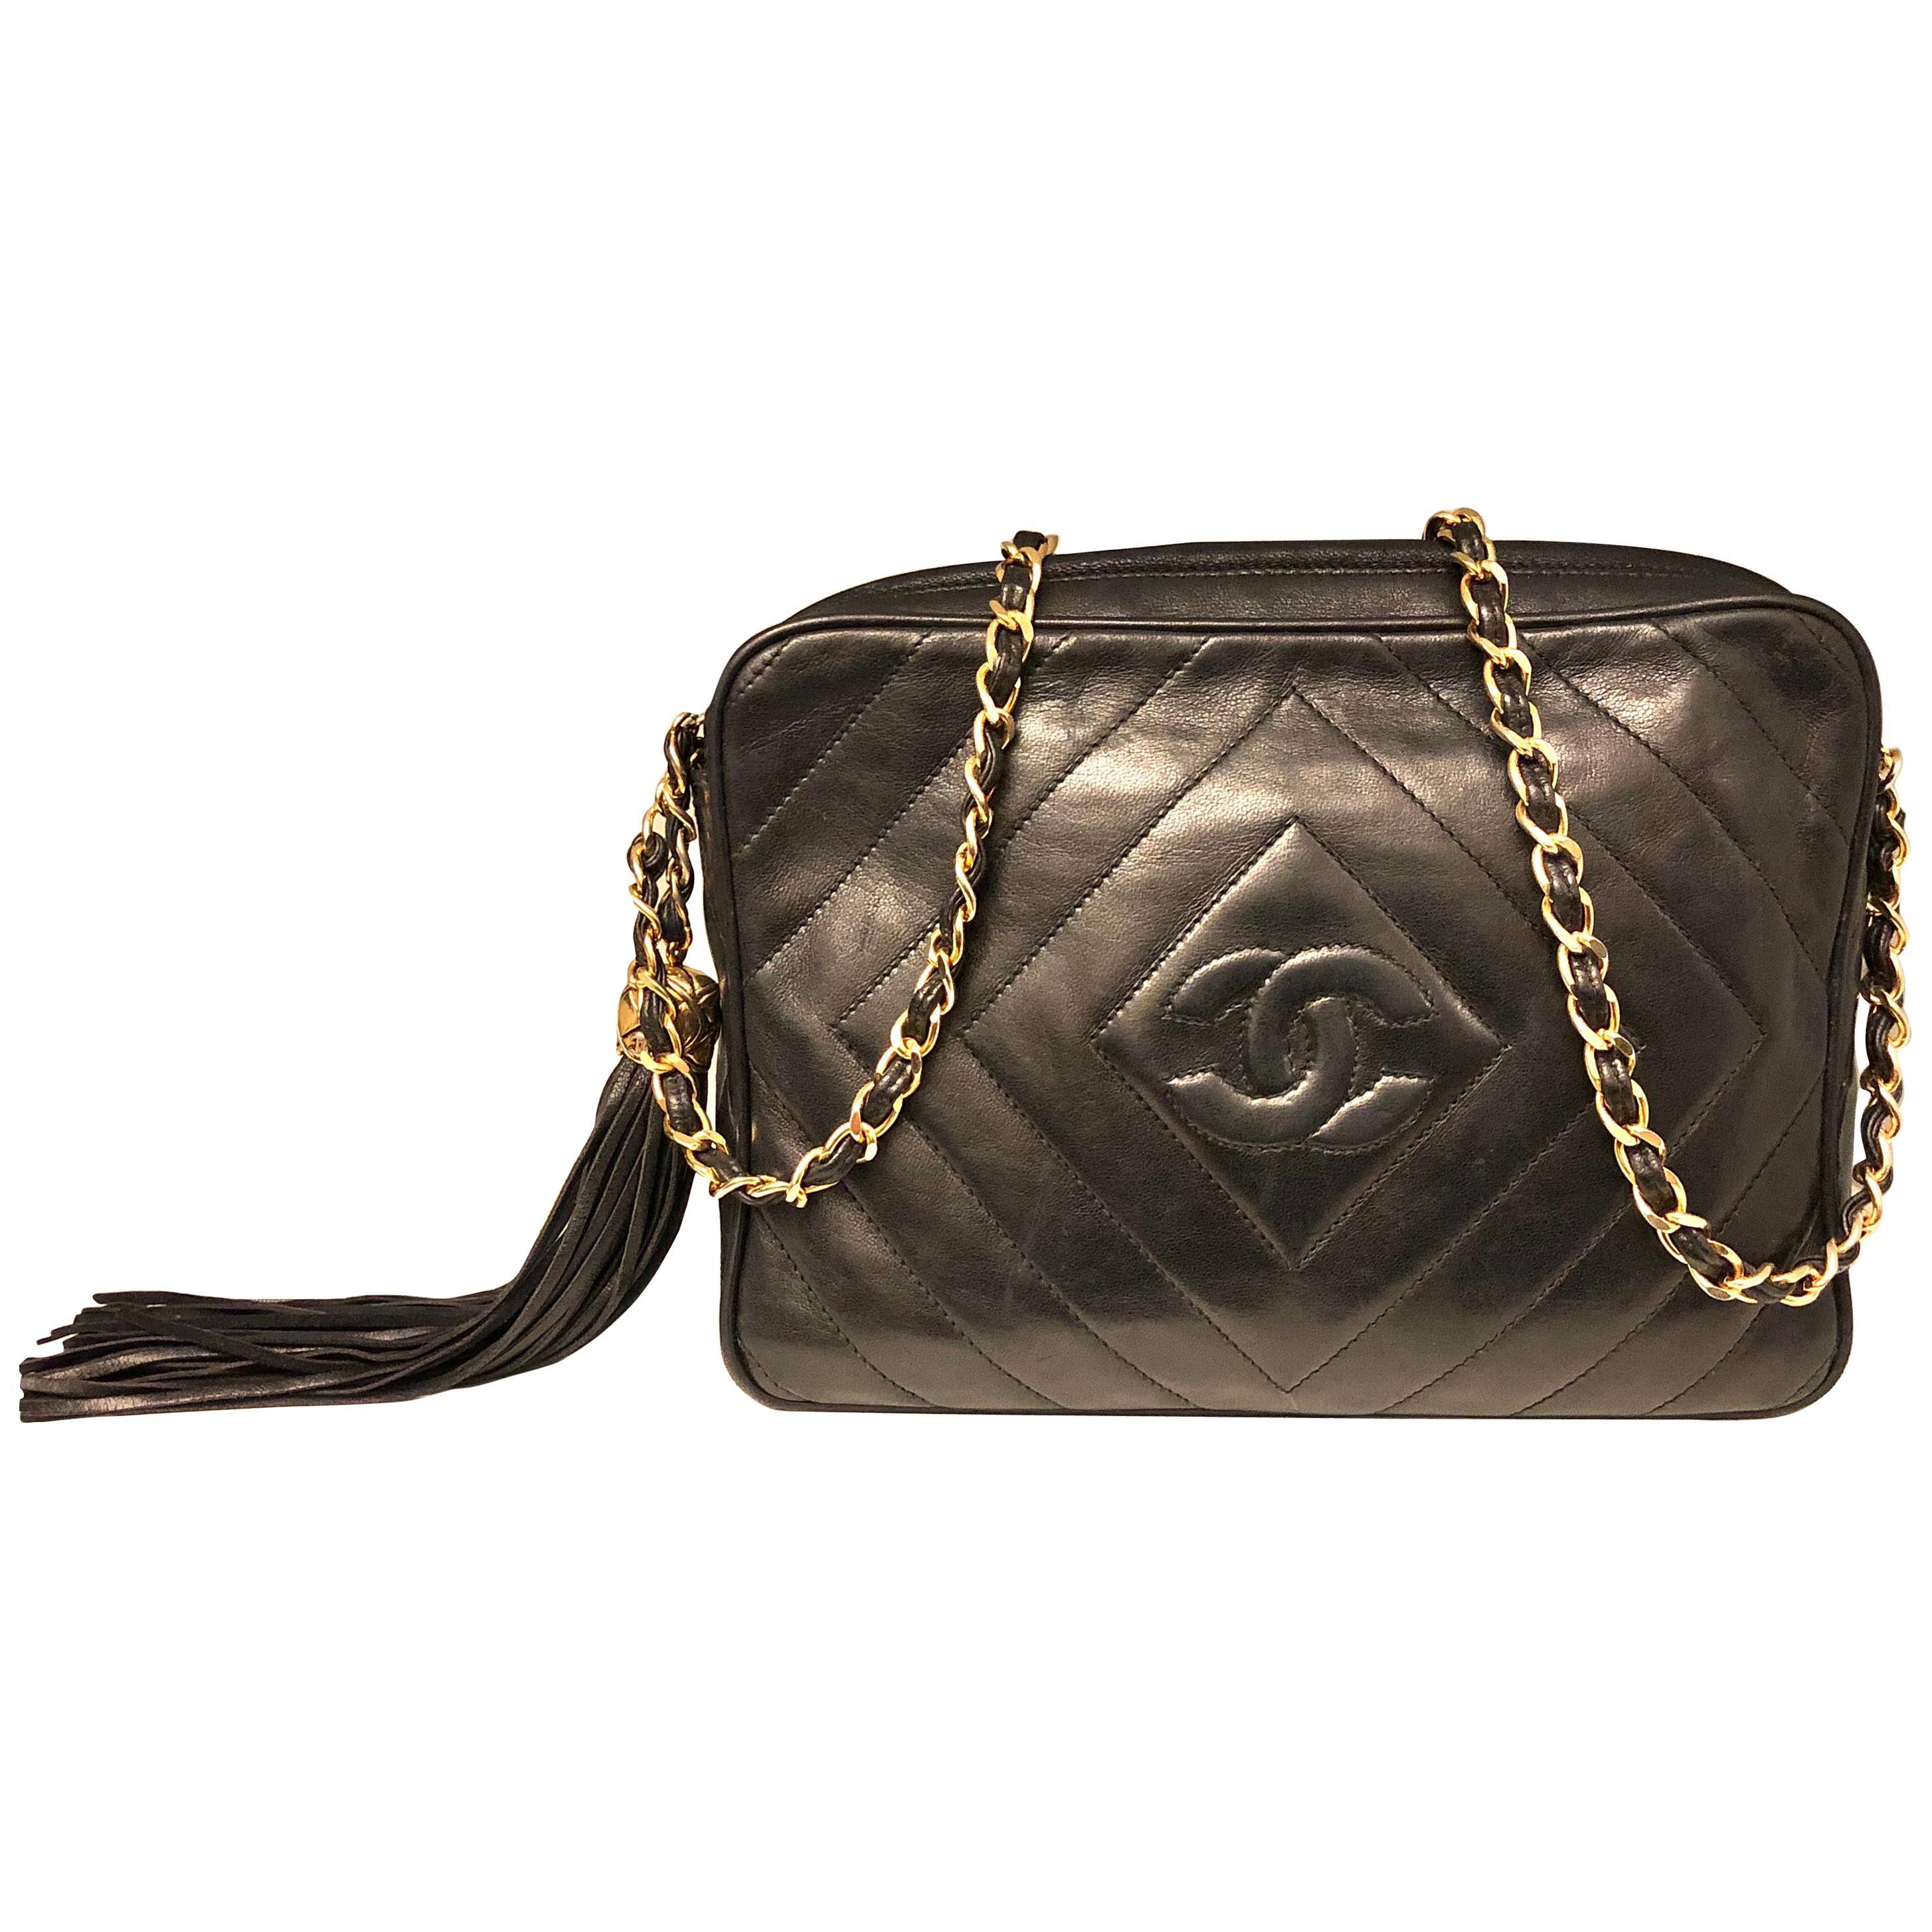 Vintage 1989 to 1991 Chanel black lambskin camera bag with tassel.